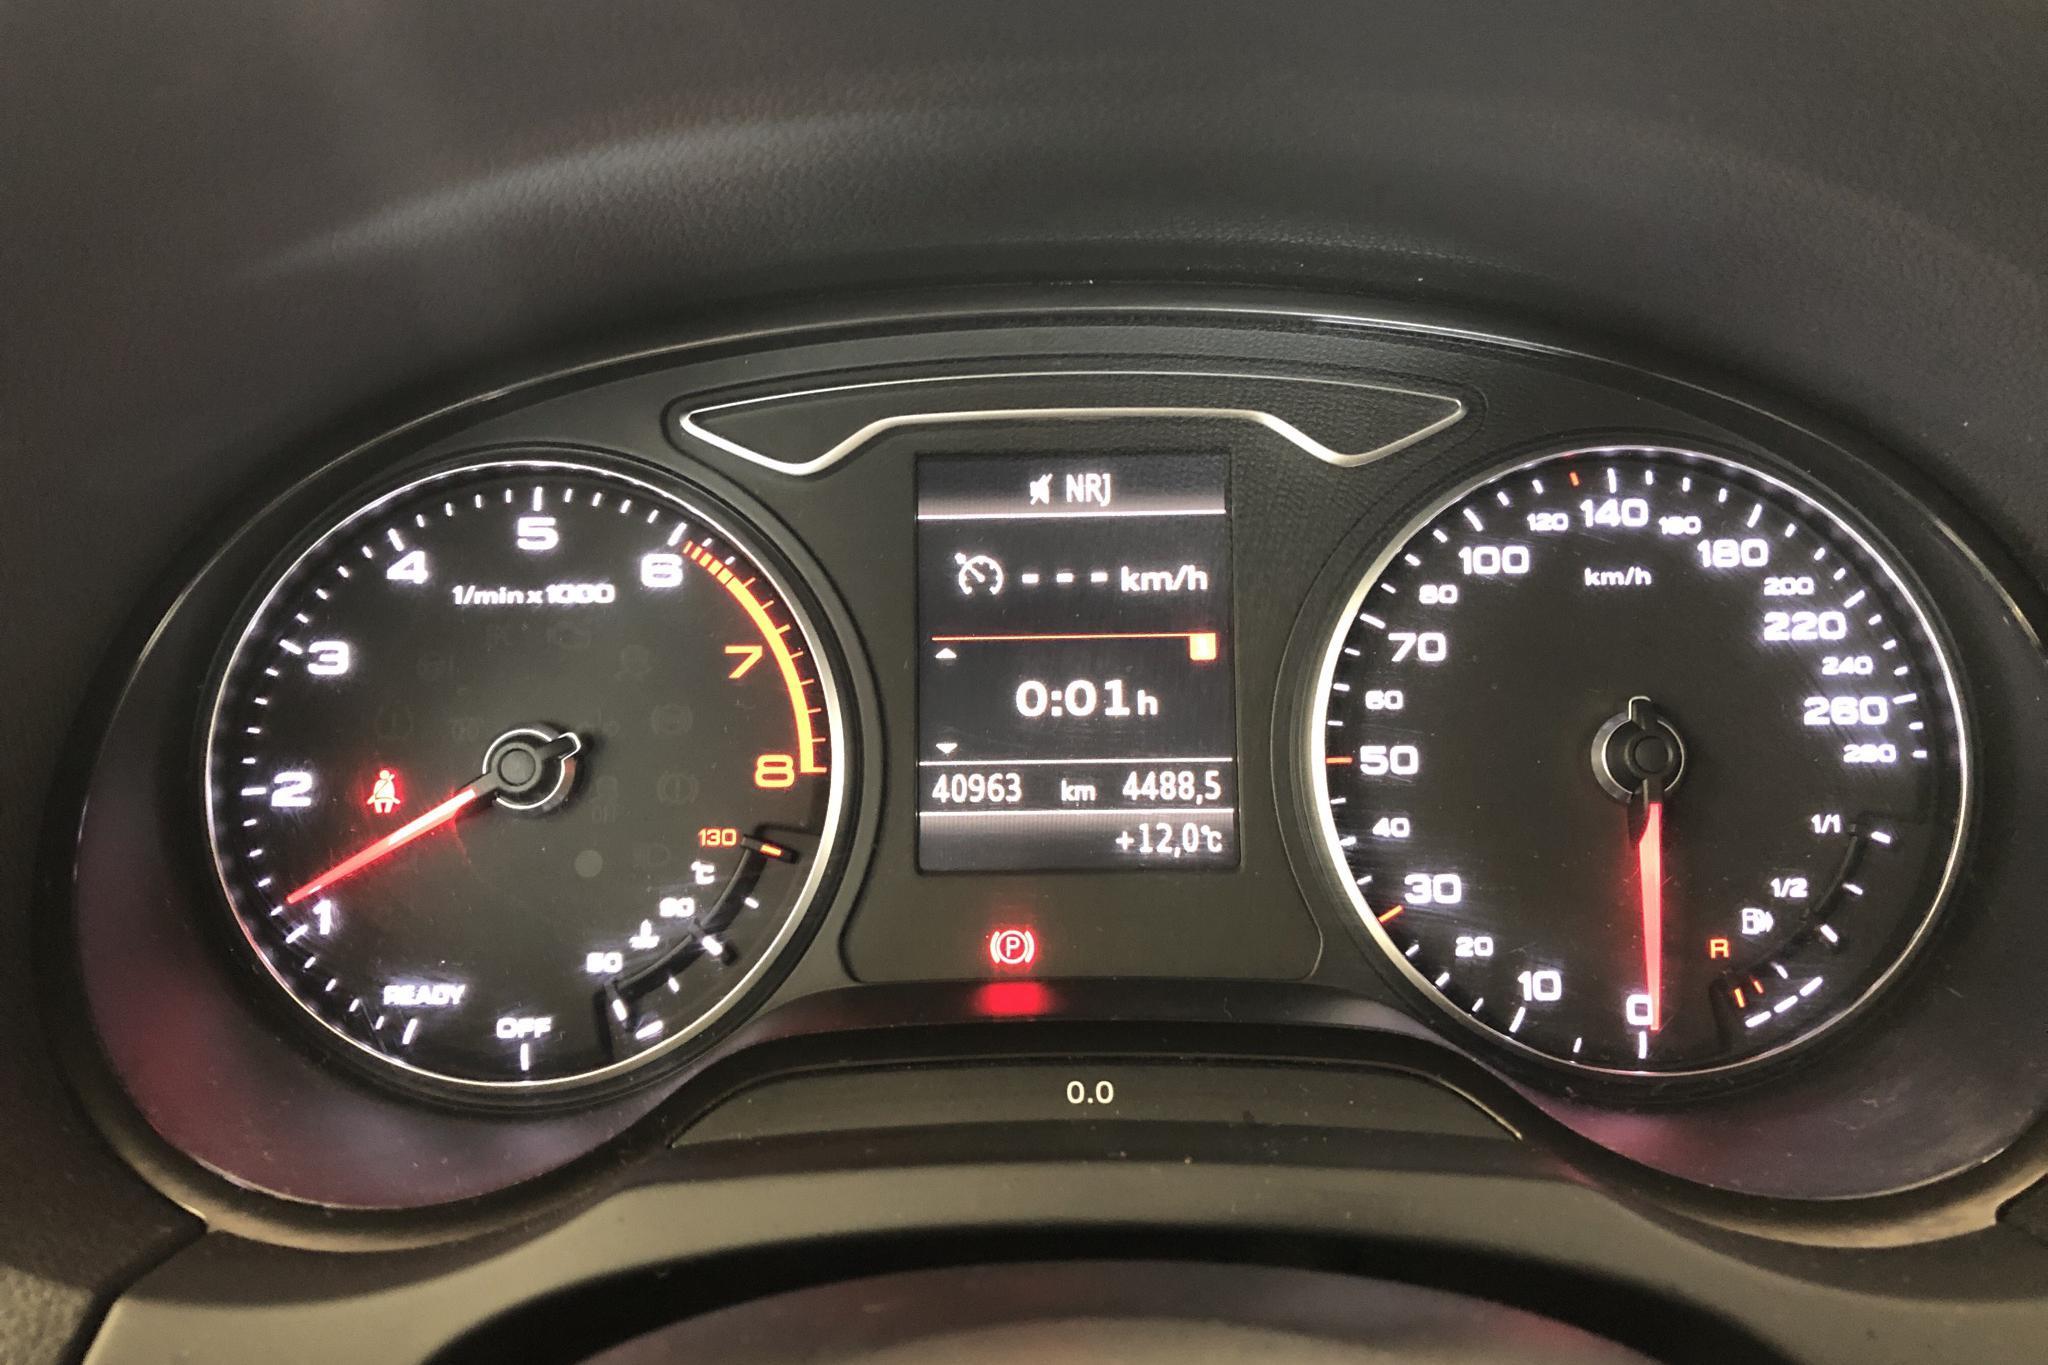 Audi A3 1.0 TFSI Sportback (116hk) - 40 970 km - Manual - black - 2017